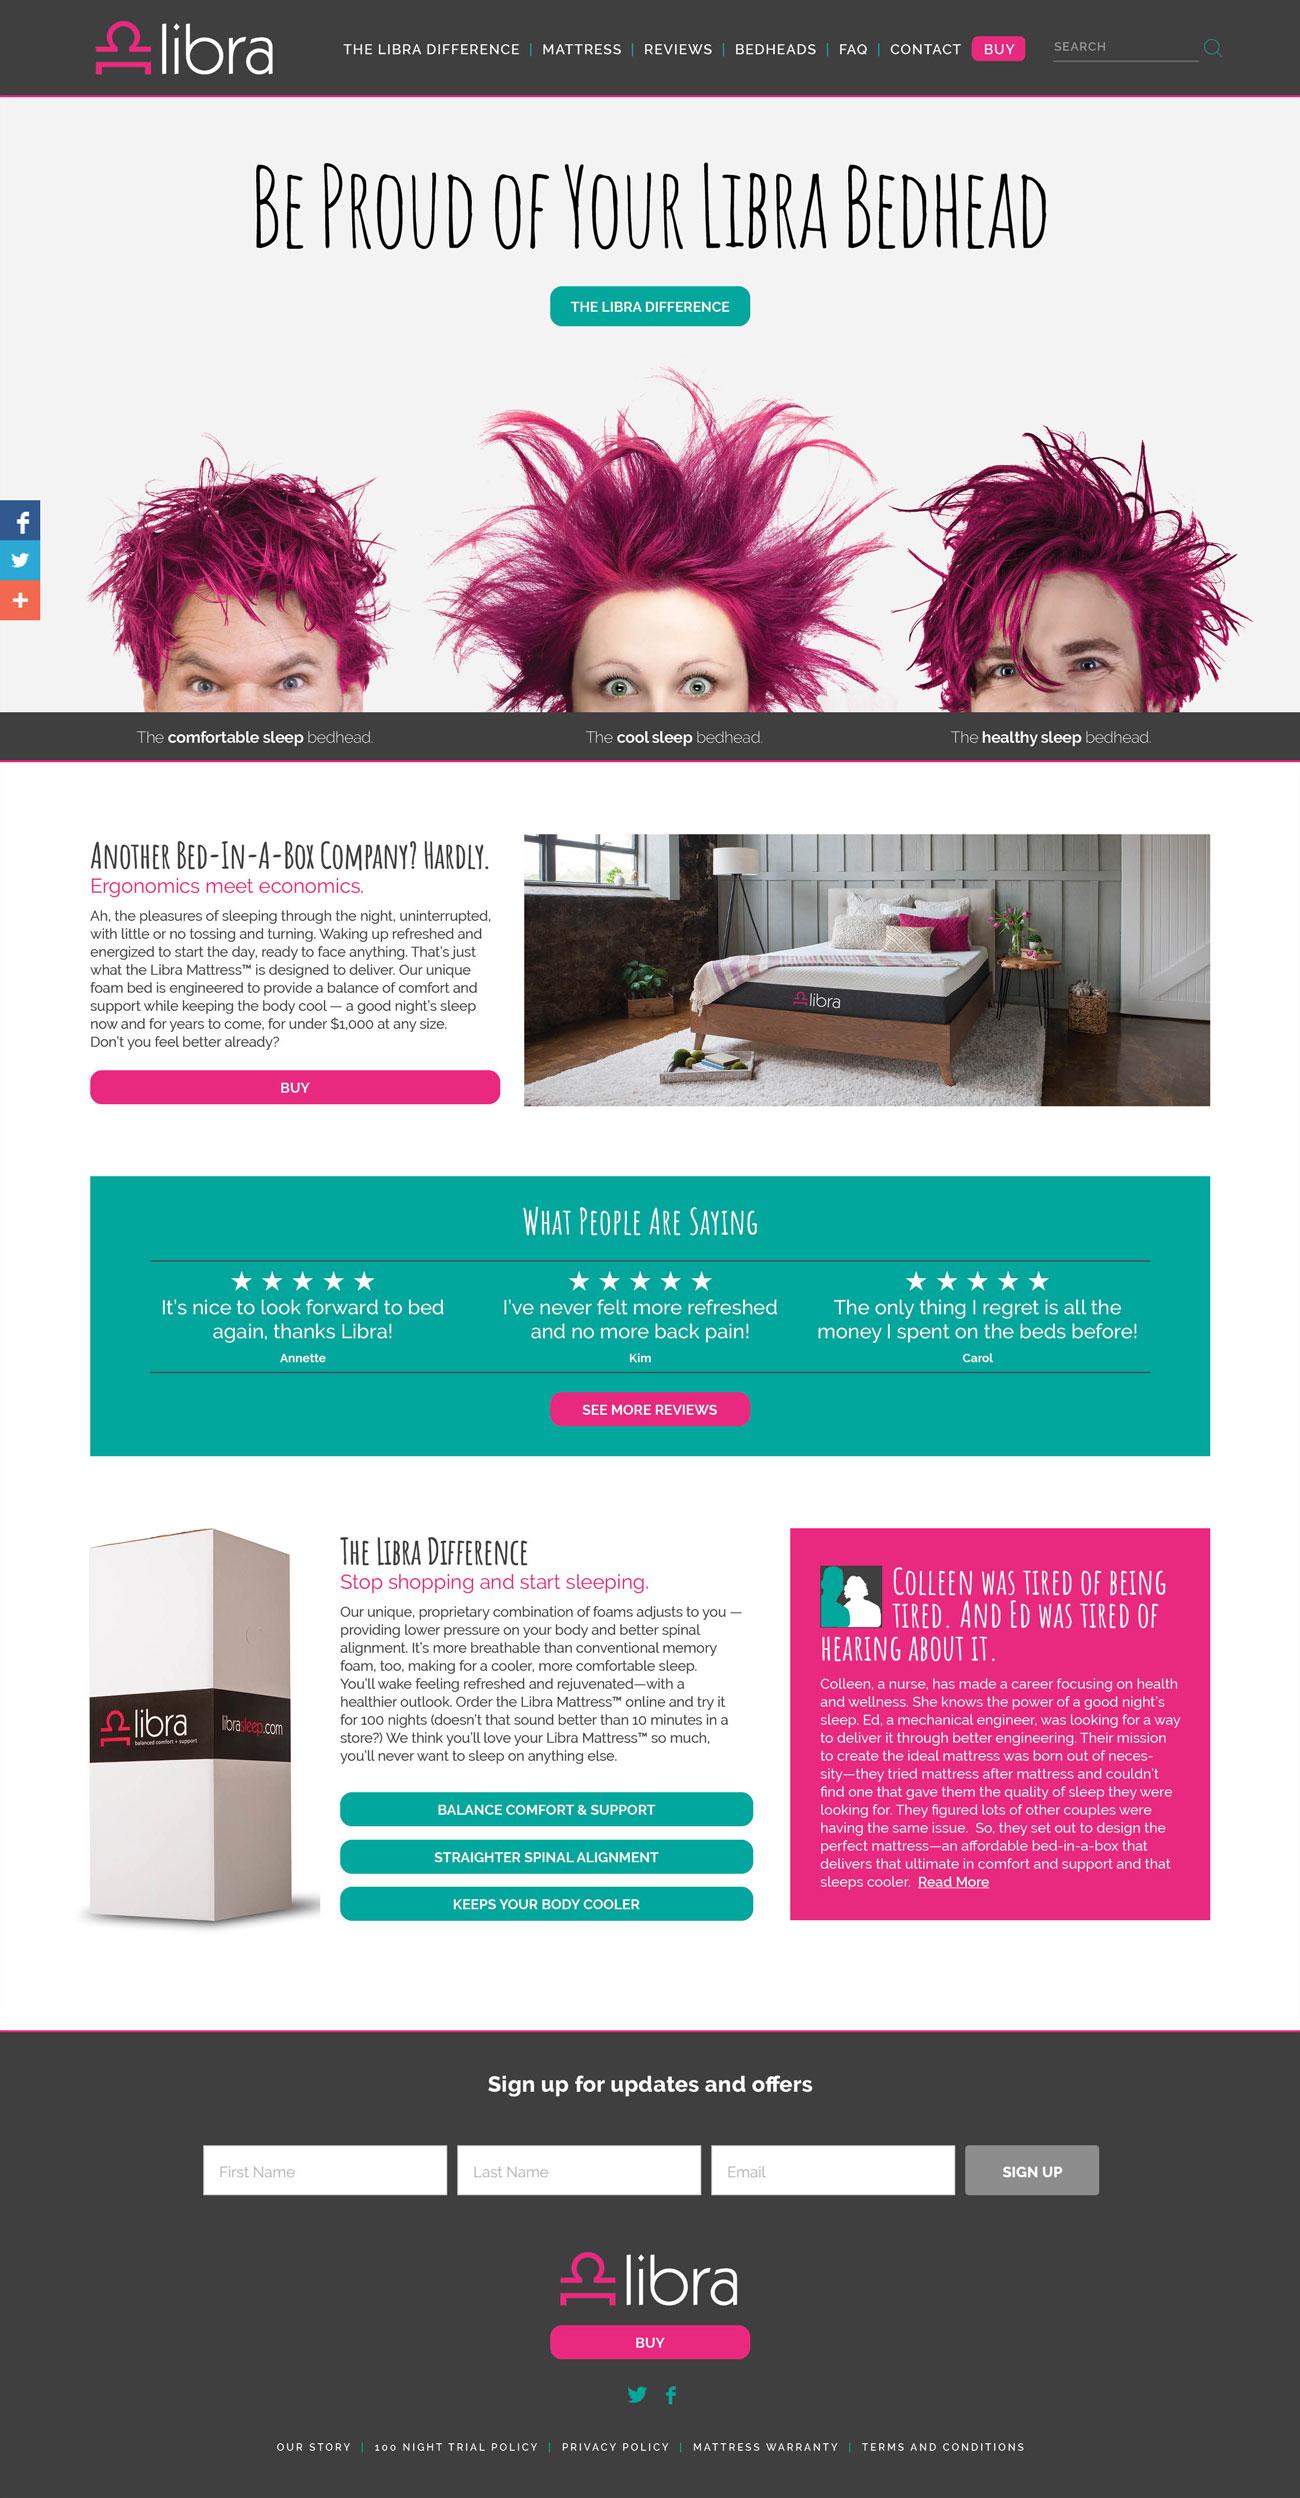 Libra Mattress Homepage